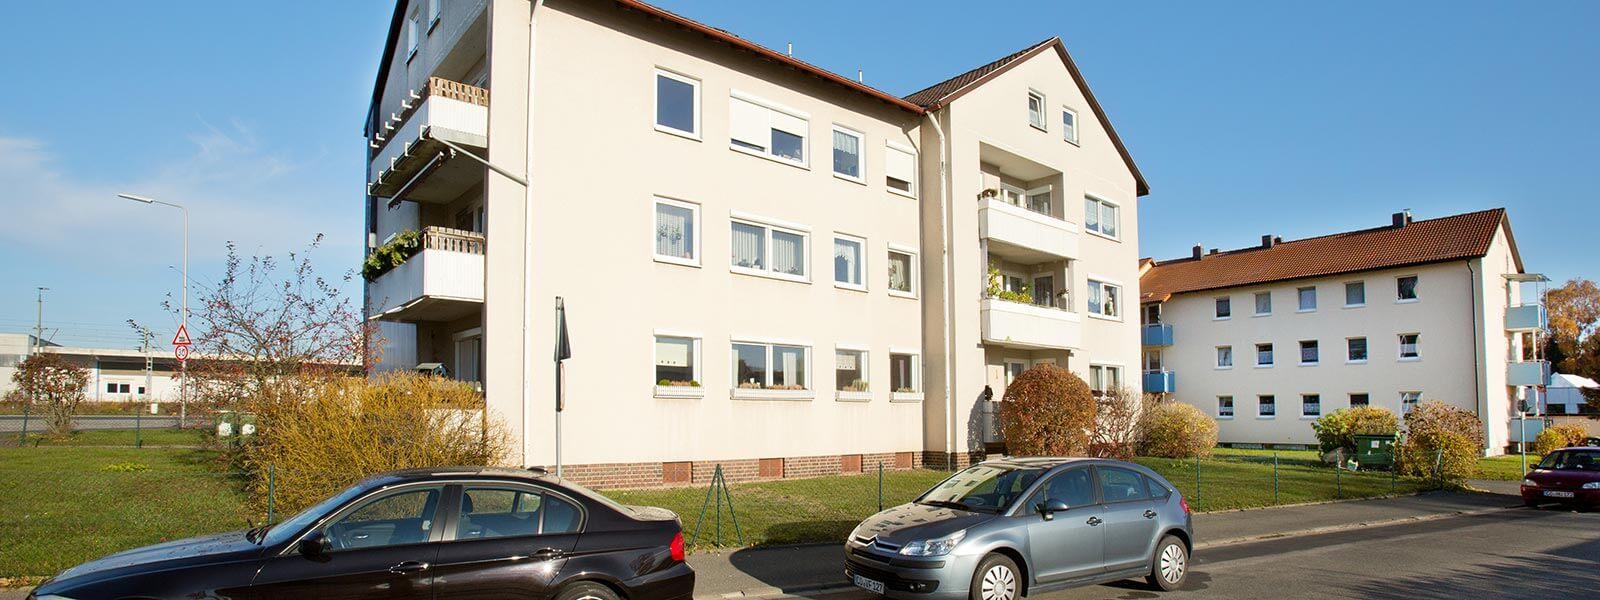 GWG-Feldstraße-Titel